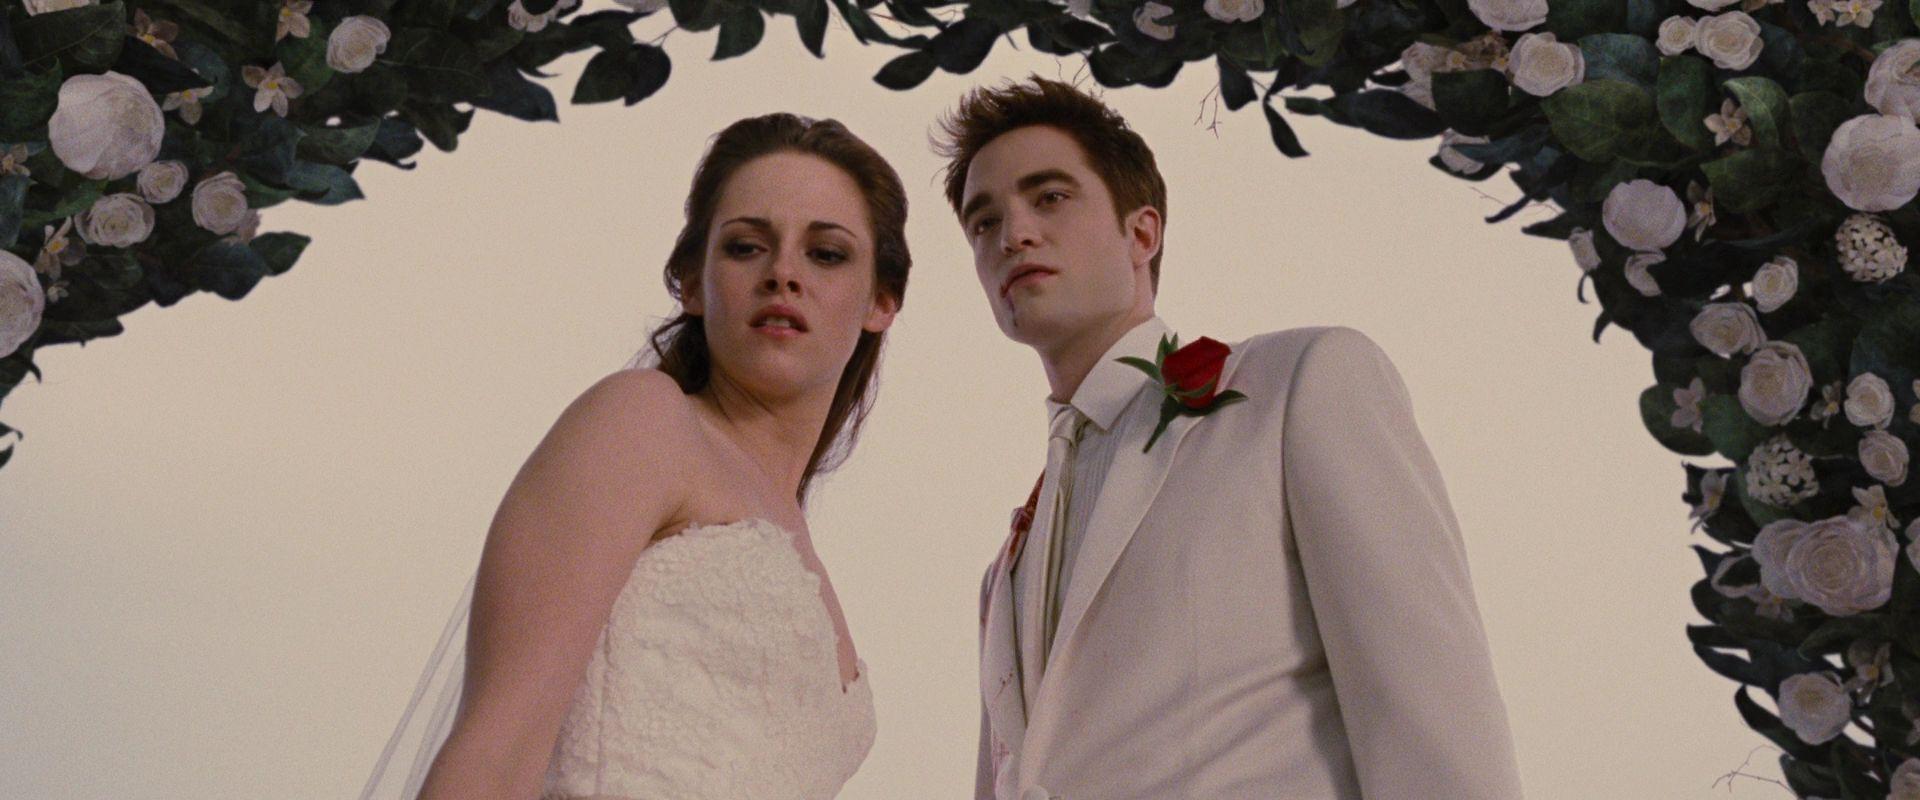 Dream Wedding Dress vs. Real Wedding Dress - Bella Swan - Fanpop